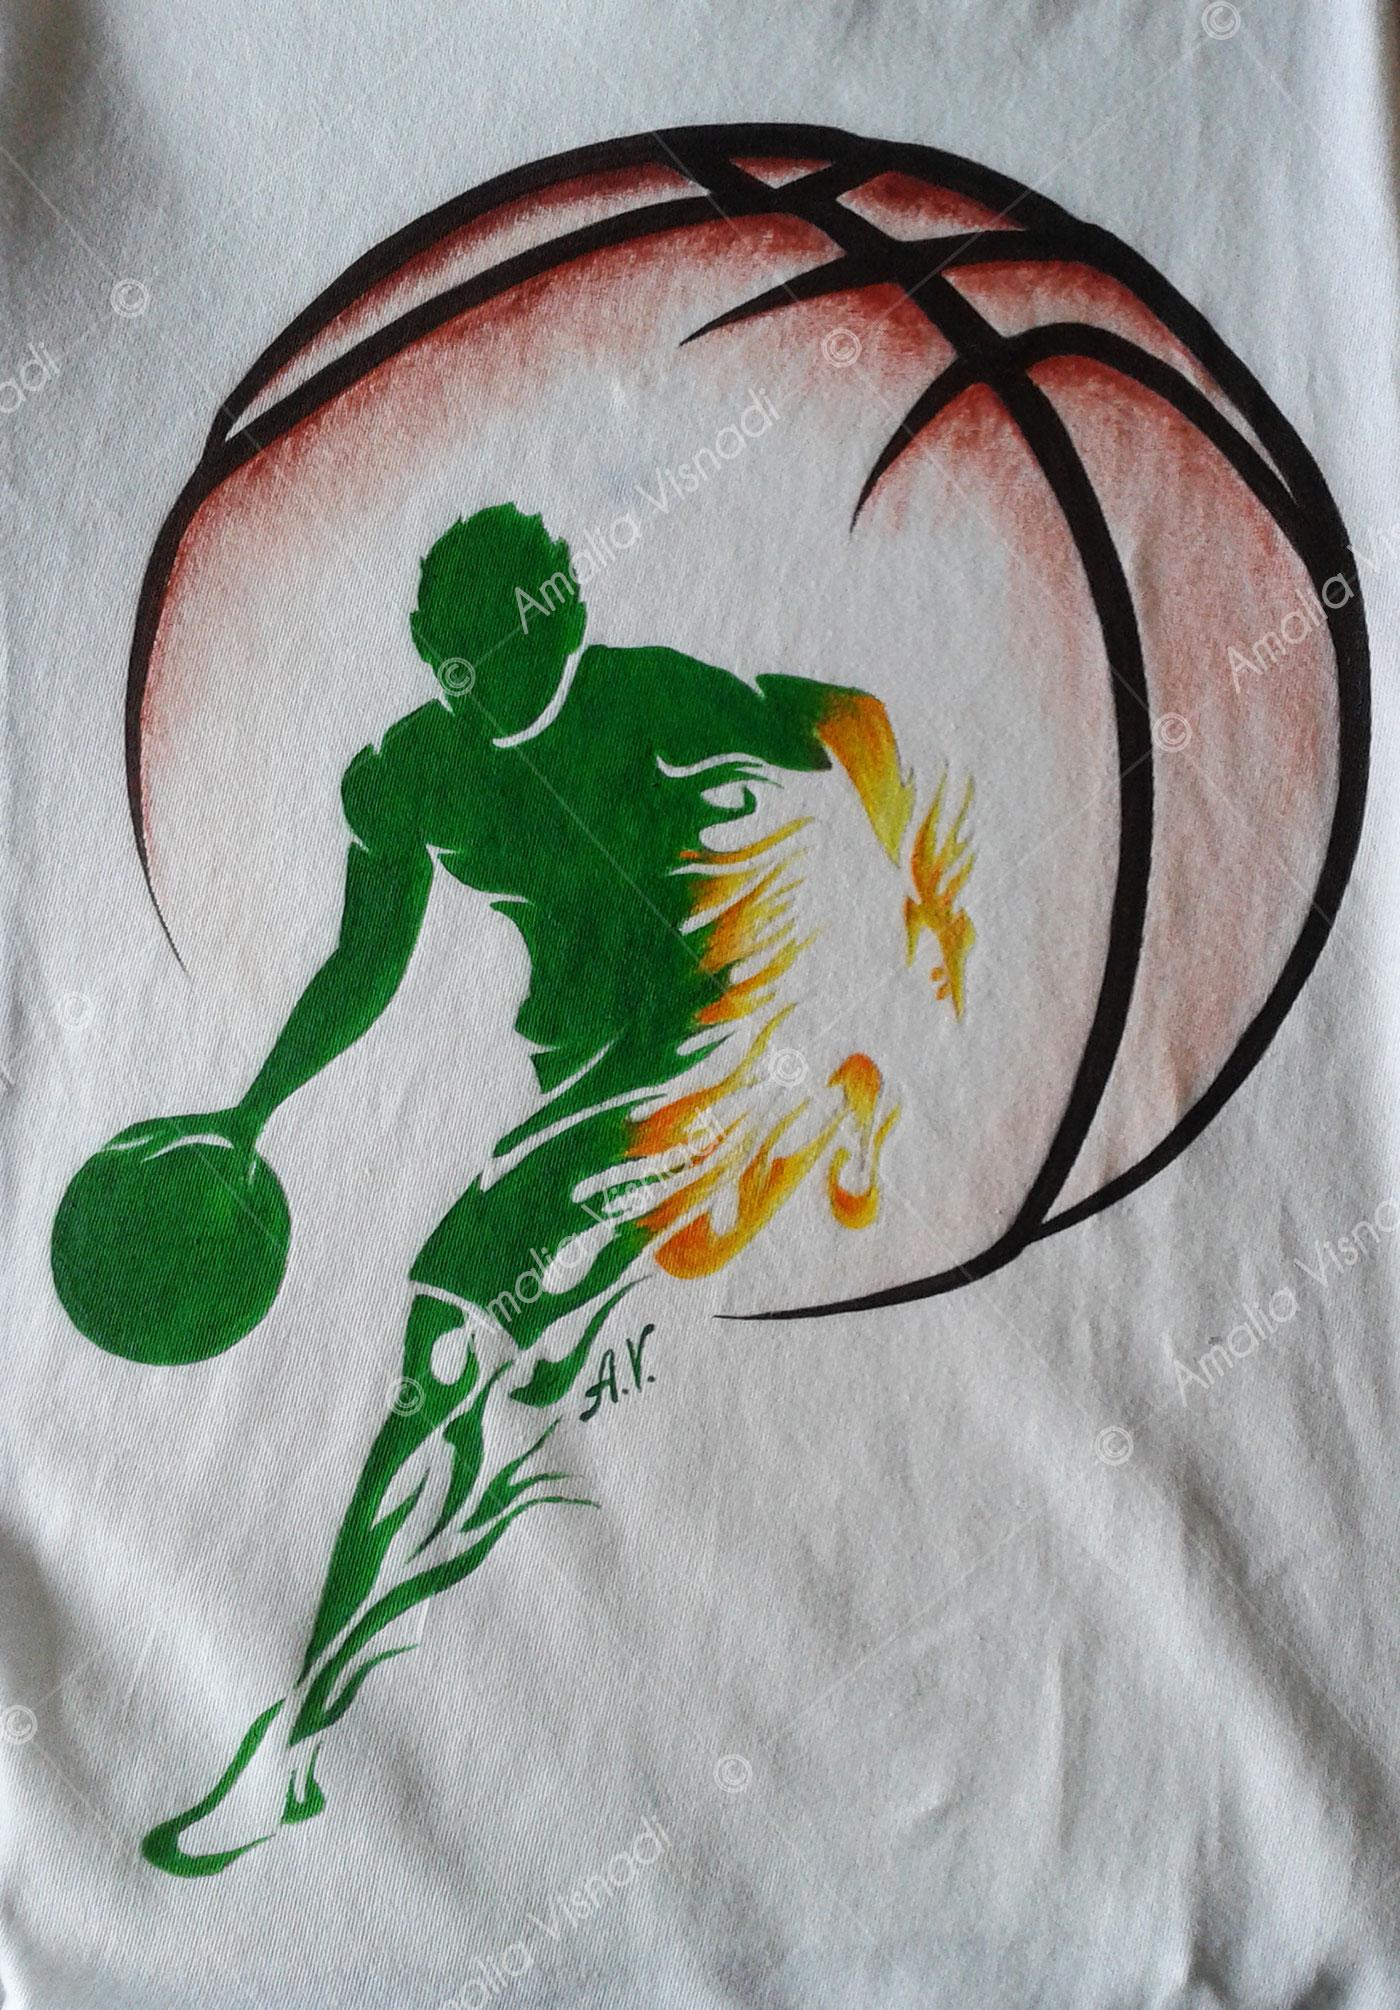 Amalia Visnadi_Logo Basket Verde su T-shirt